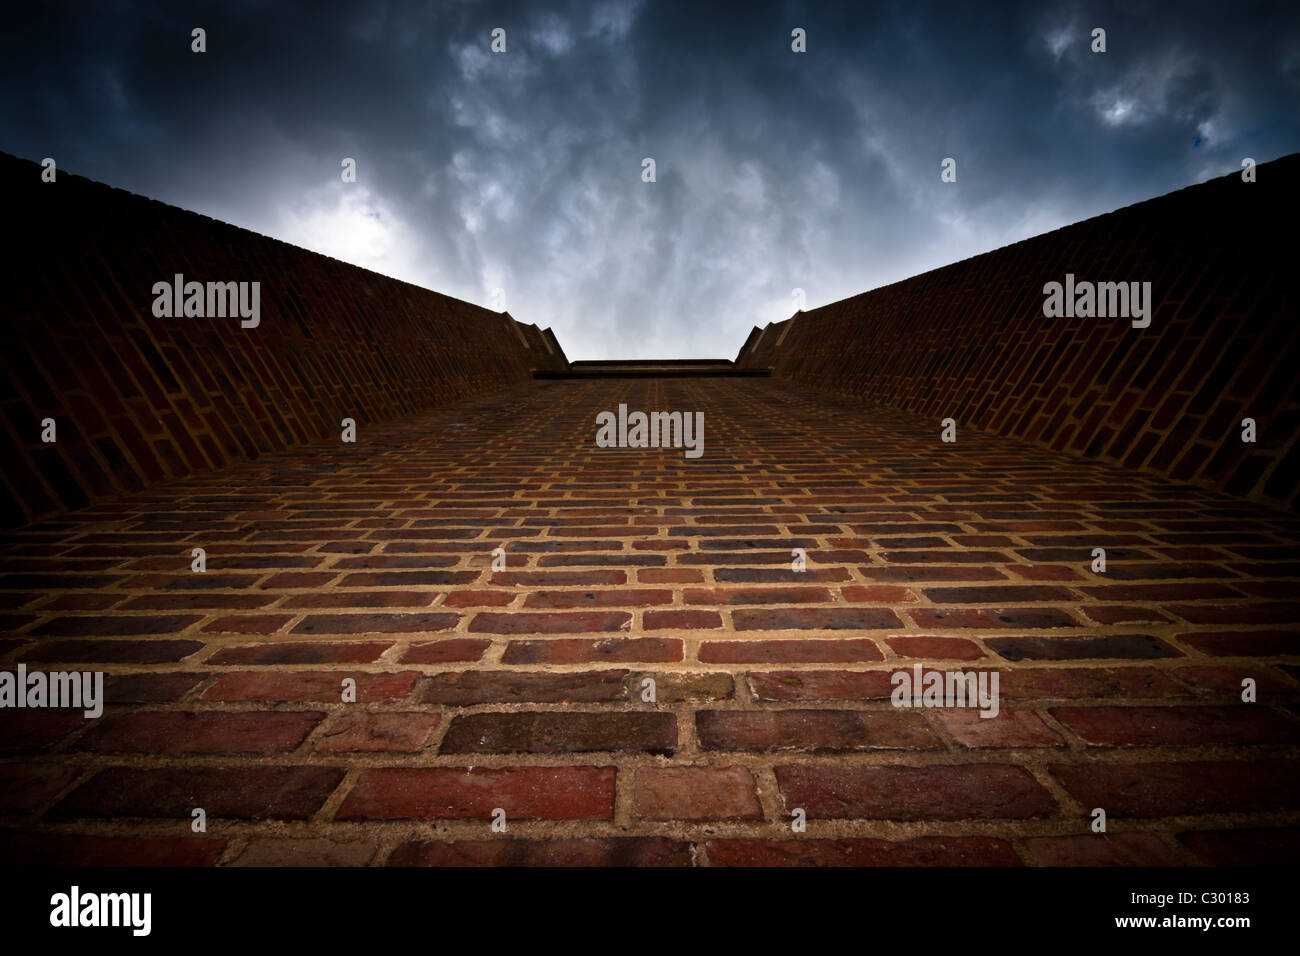 Abstract photo of brick wall and dramatic dark sky - Stock Image